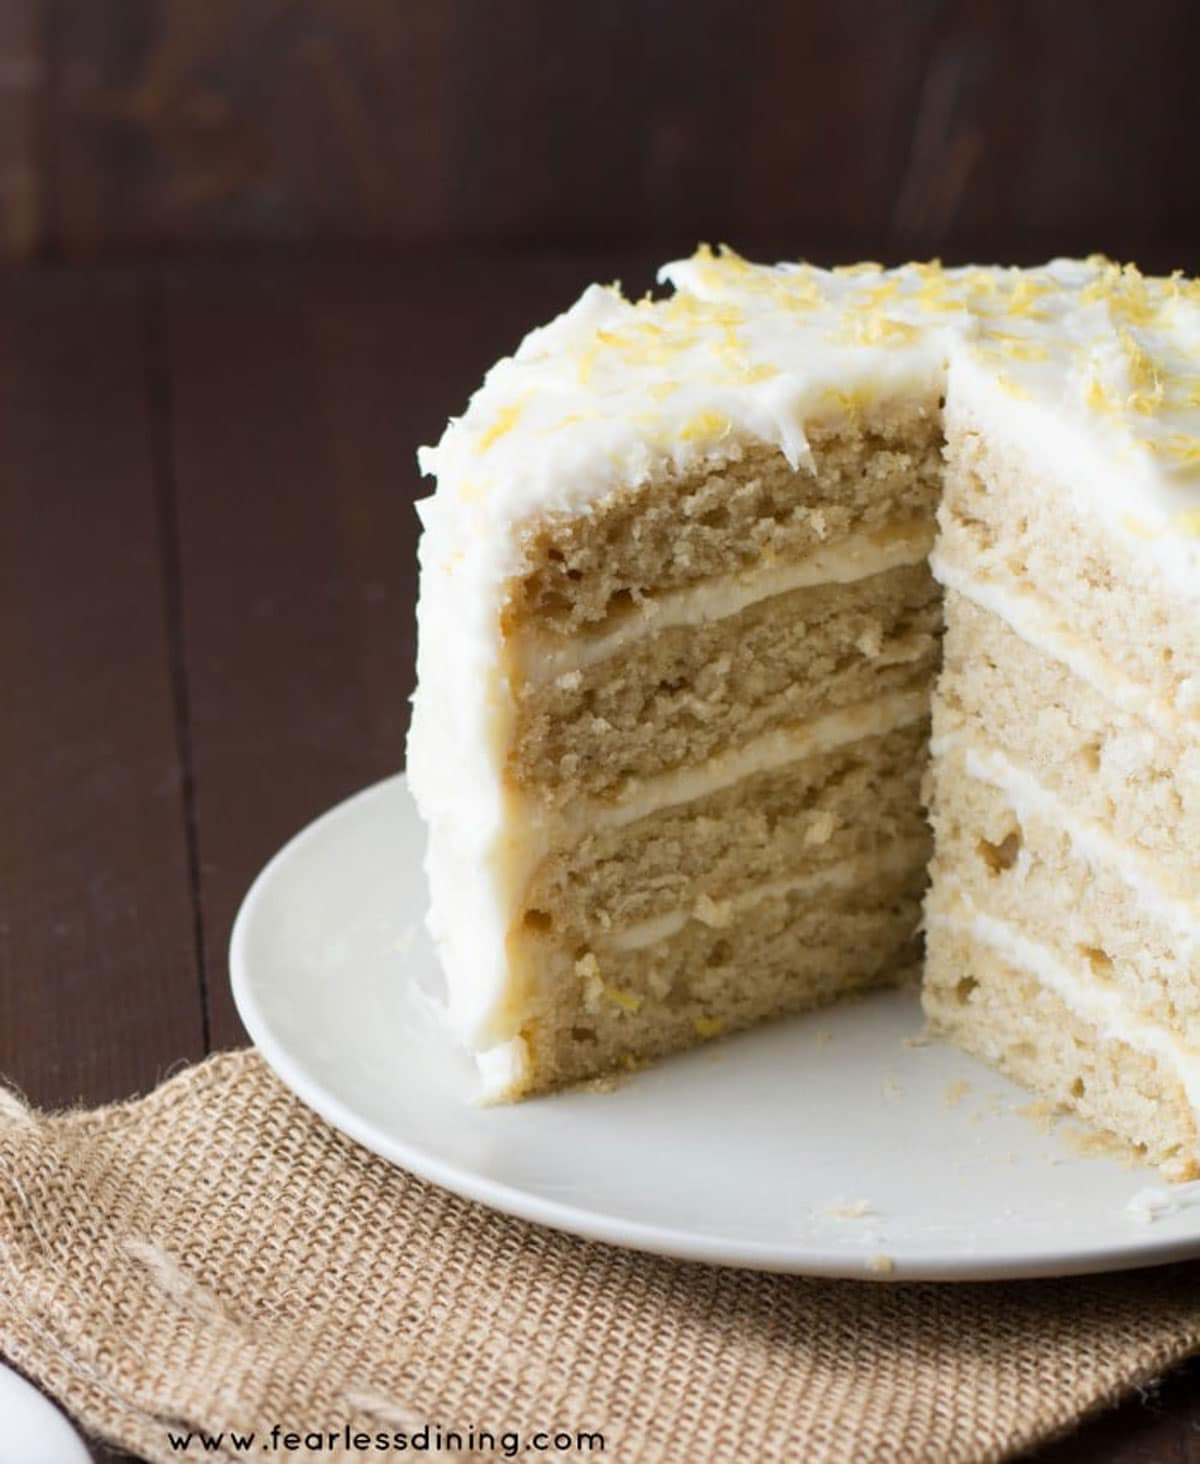 a whole lemon cake with a slice cut out